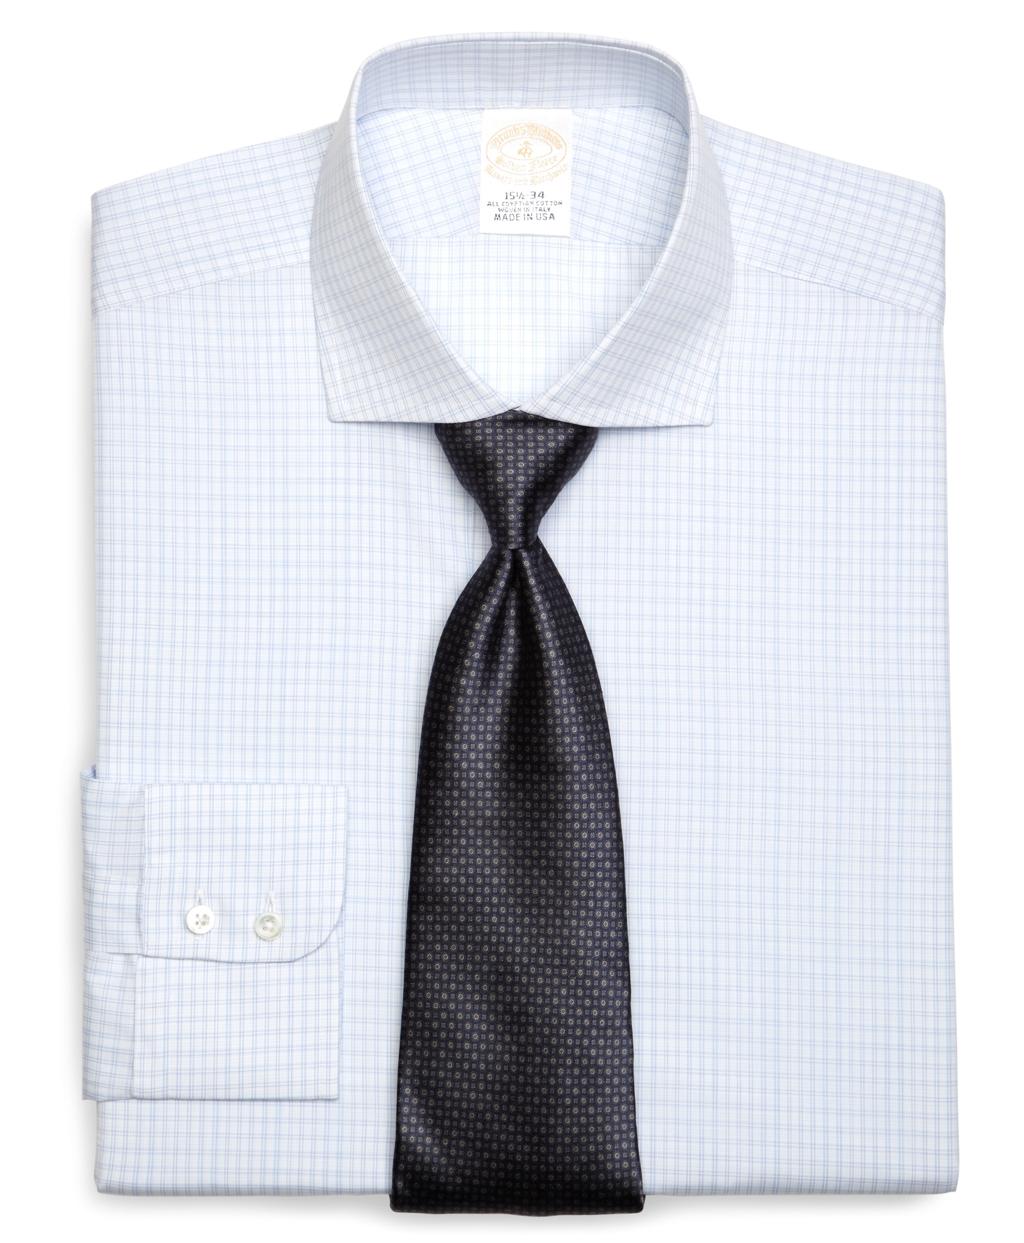 Lyst brooks brothers golden fleece regent fit small for Small collar dress shirt